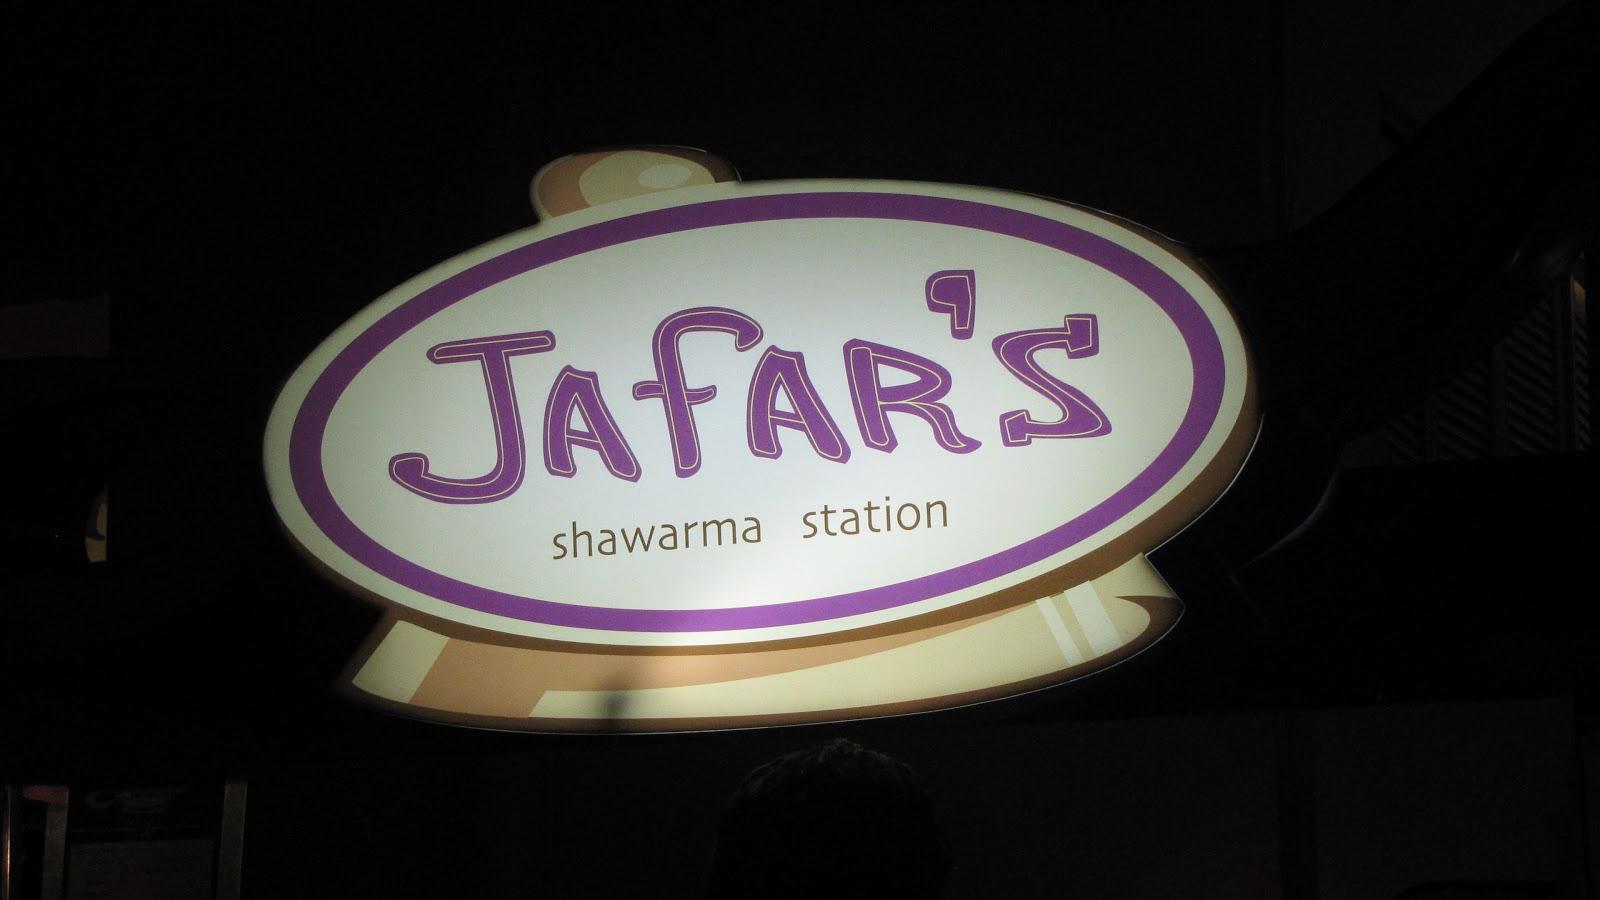 FTW! Blog - Jafar's Shawarma Station, Jafar's Shawarma Station, #032eatdrink, Shawarma, Best Shawarma